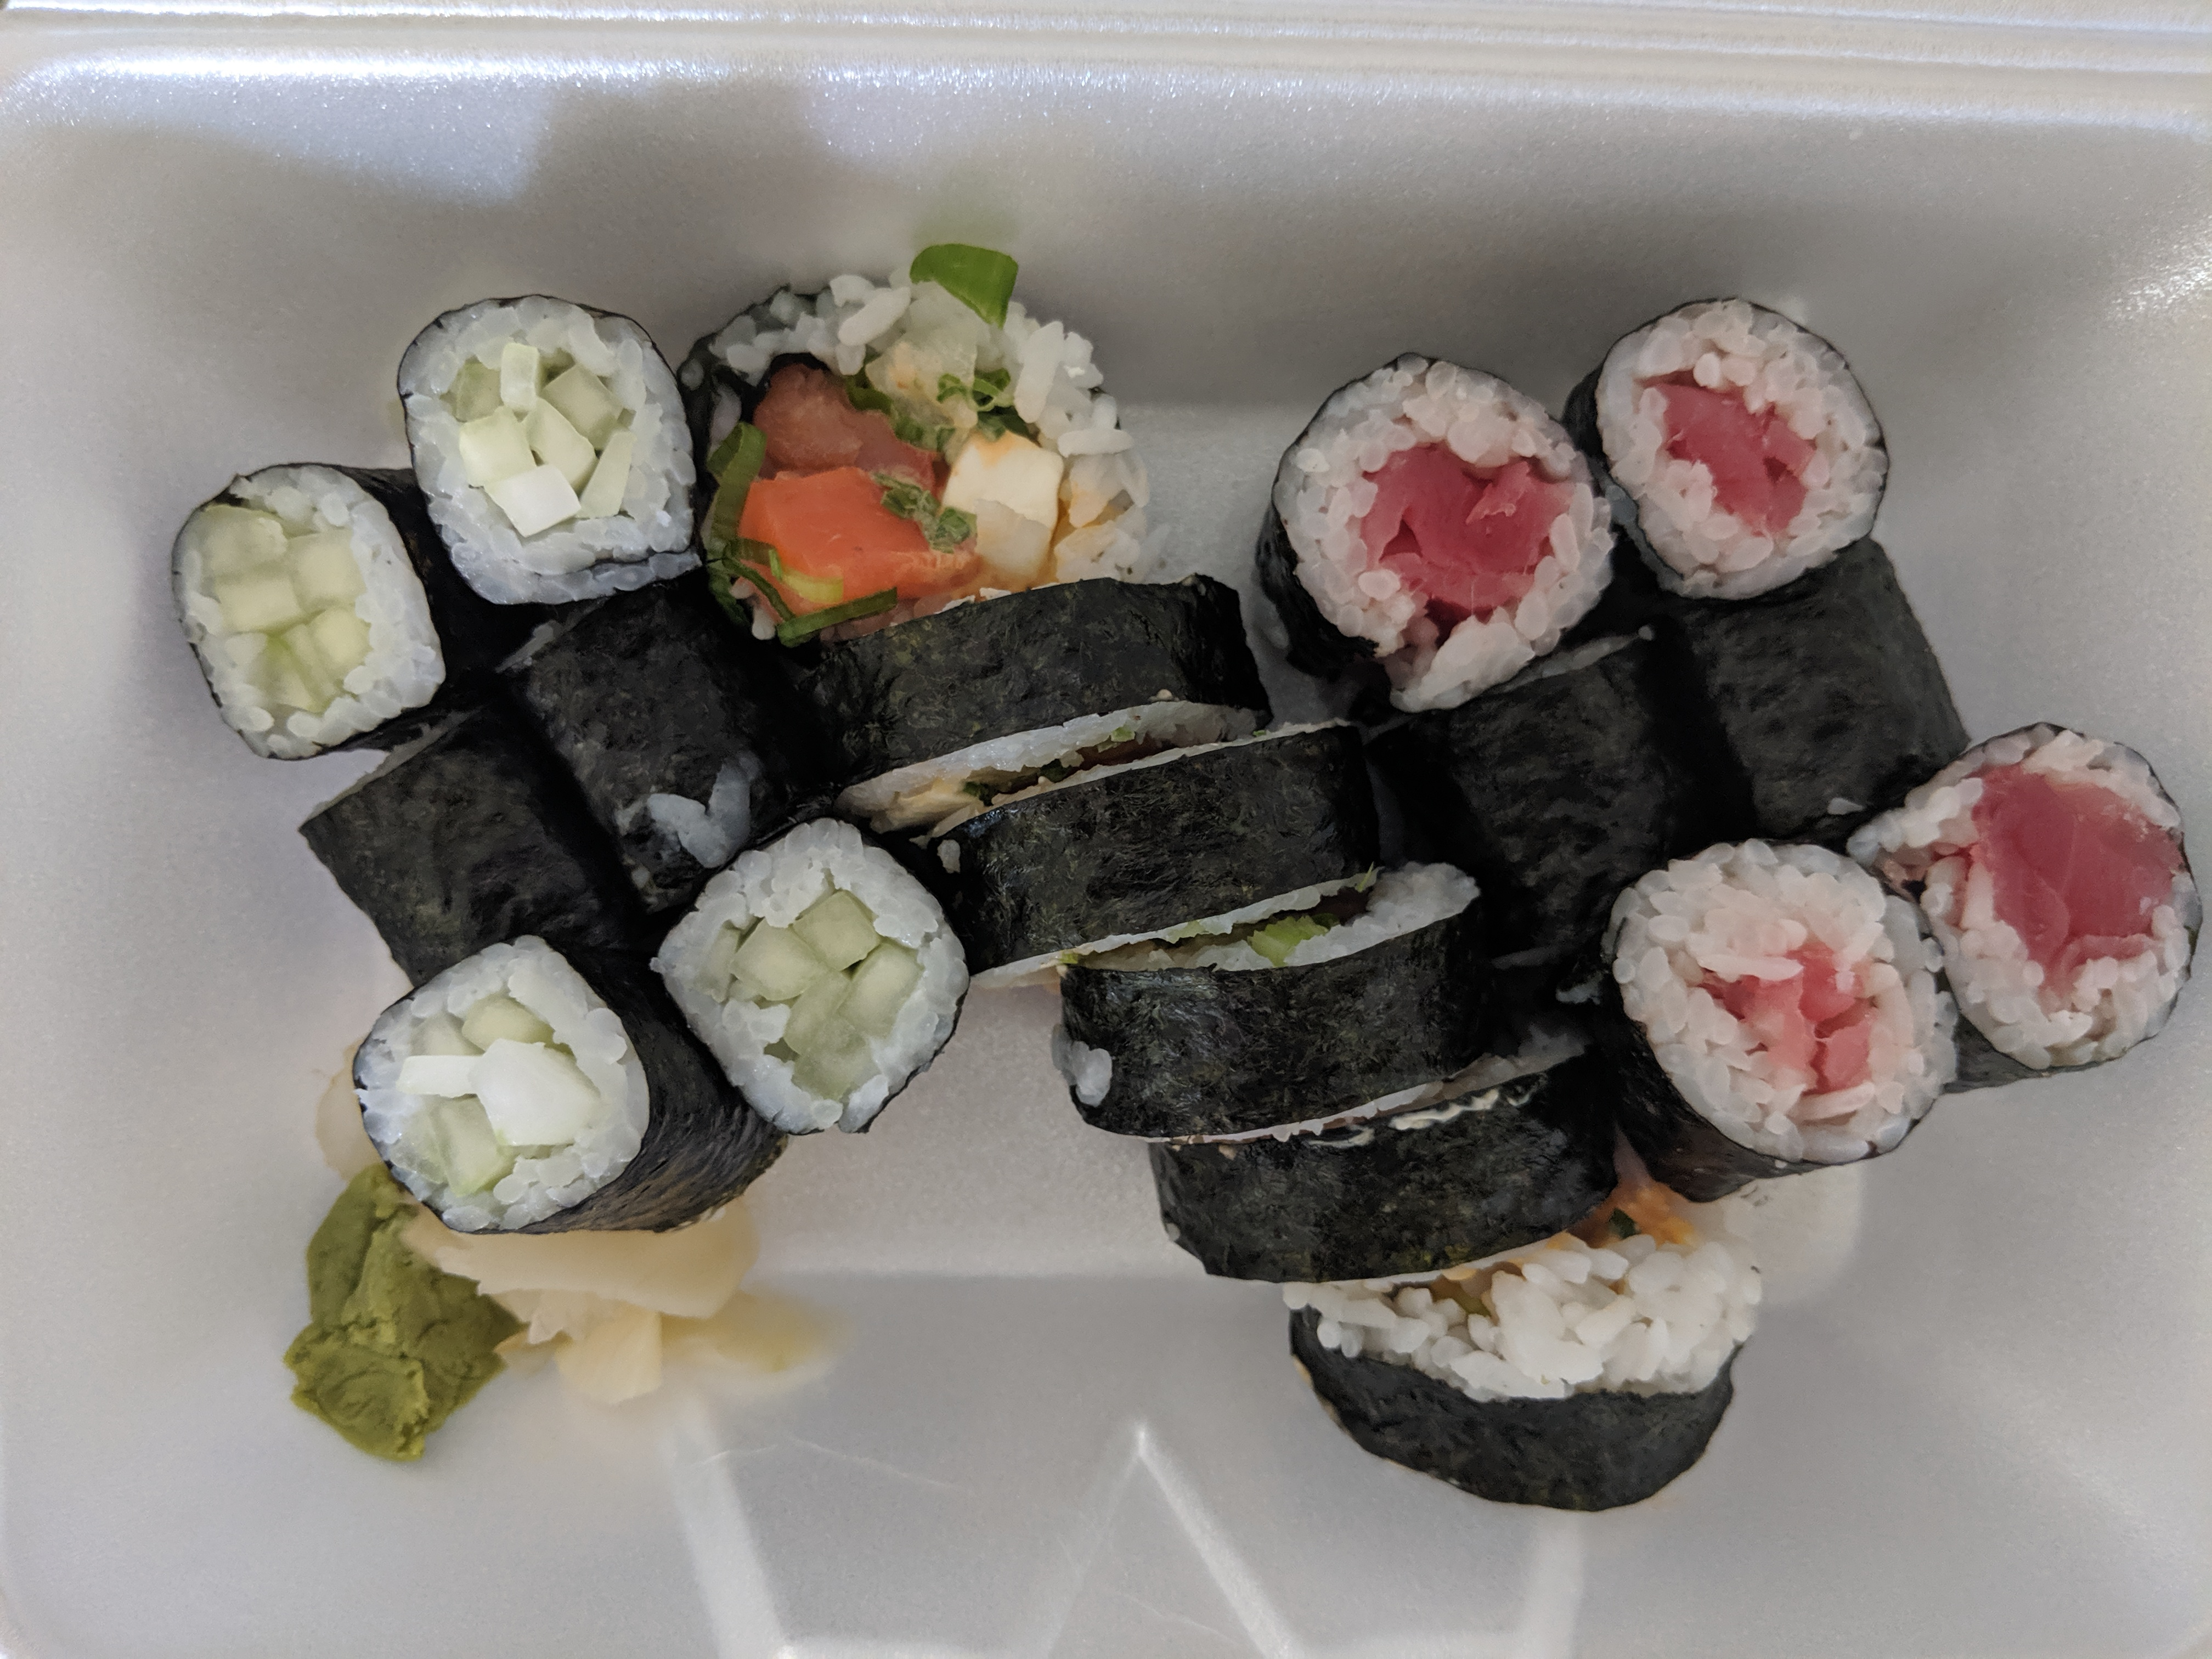 The Not Even Close To Definitive Guide To Utility Sushi In Okc Kā arī ir iespējama ēdienu piegāde liepājā. utility sushi in okc